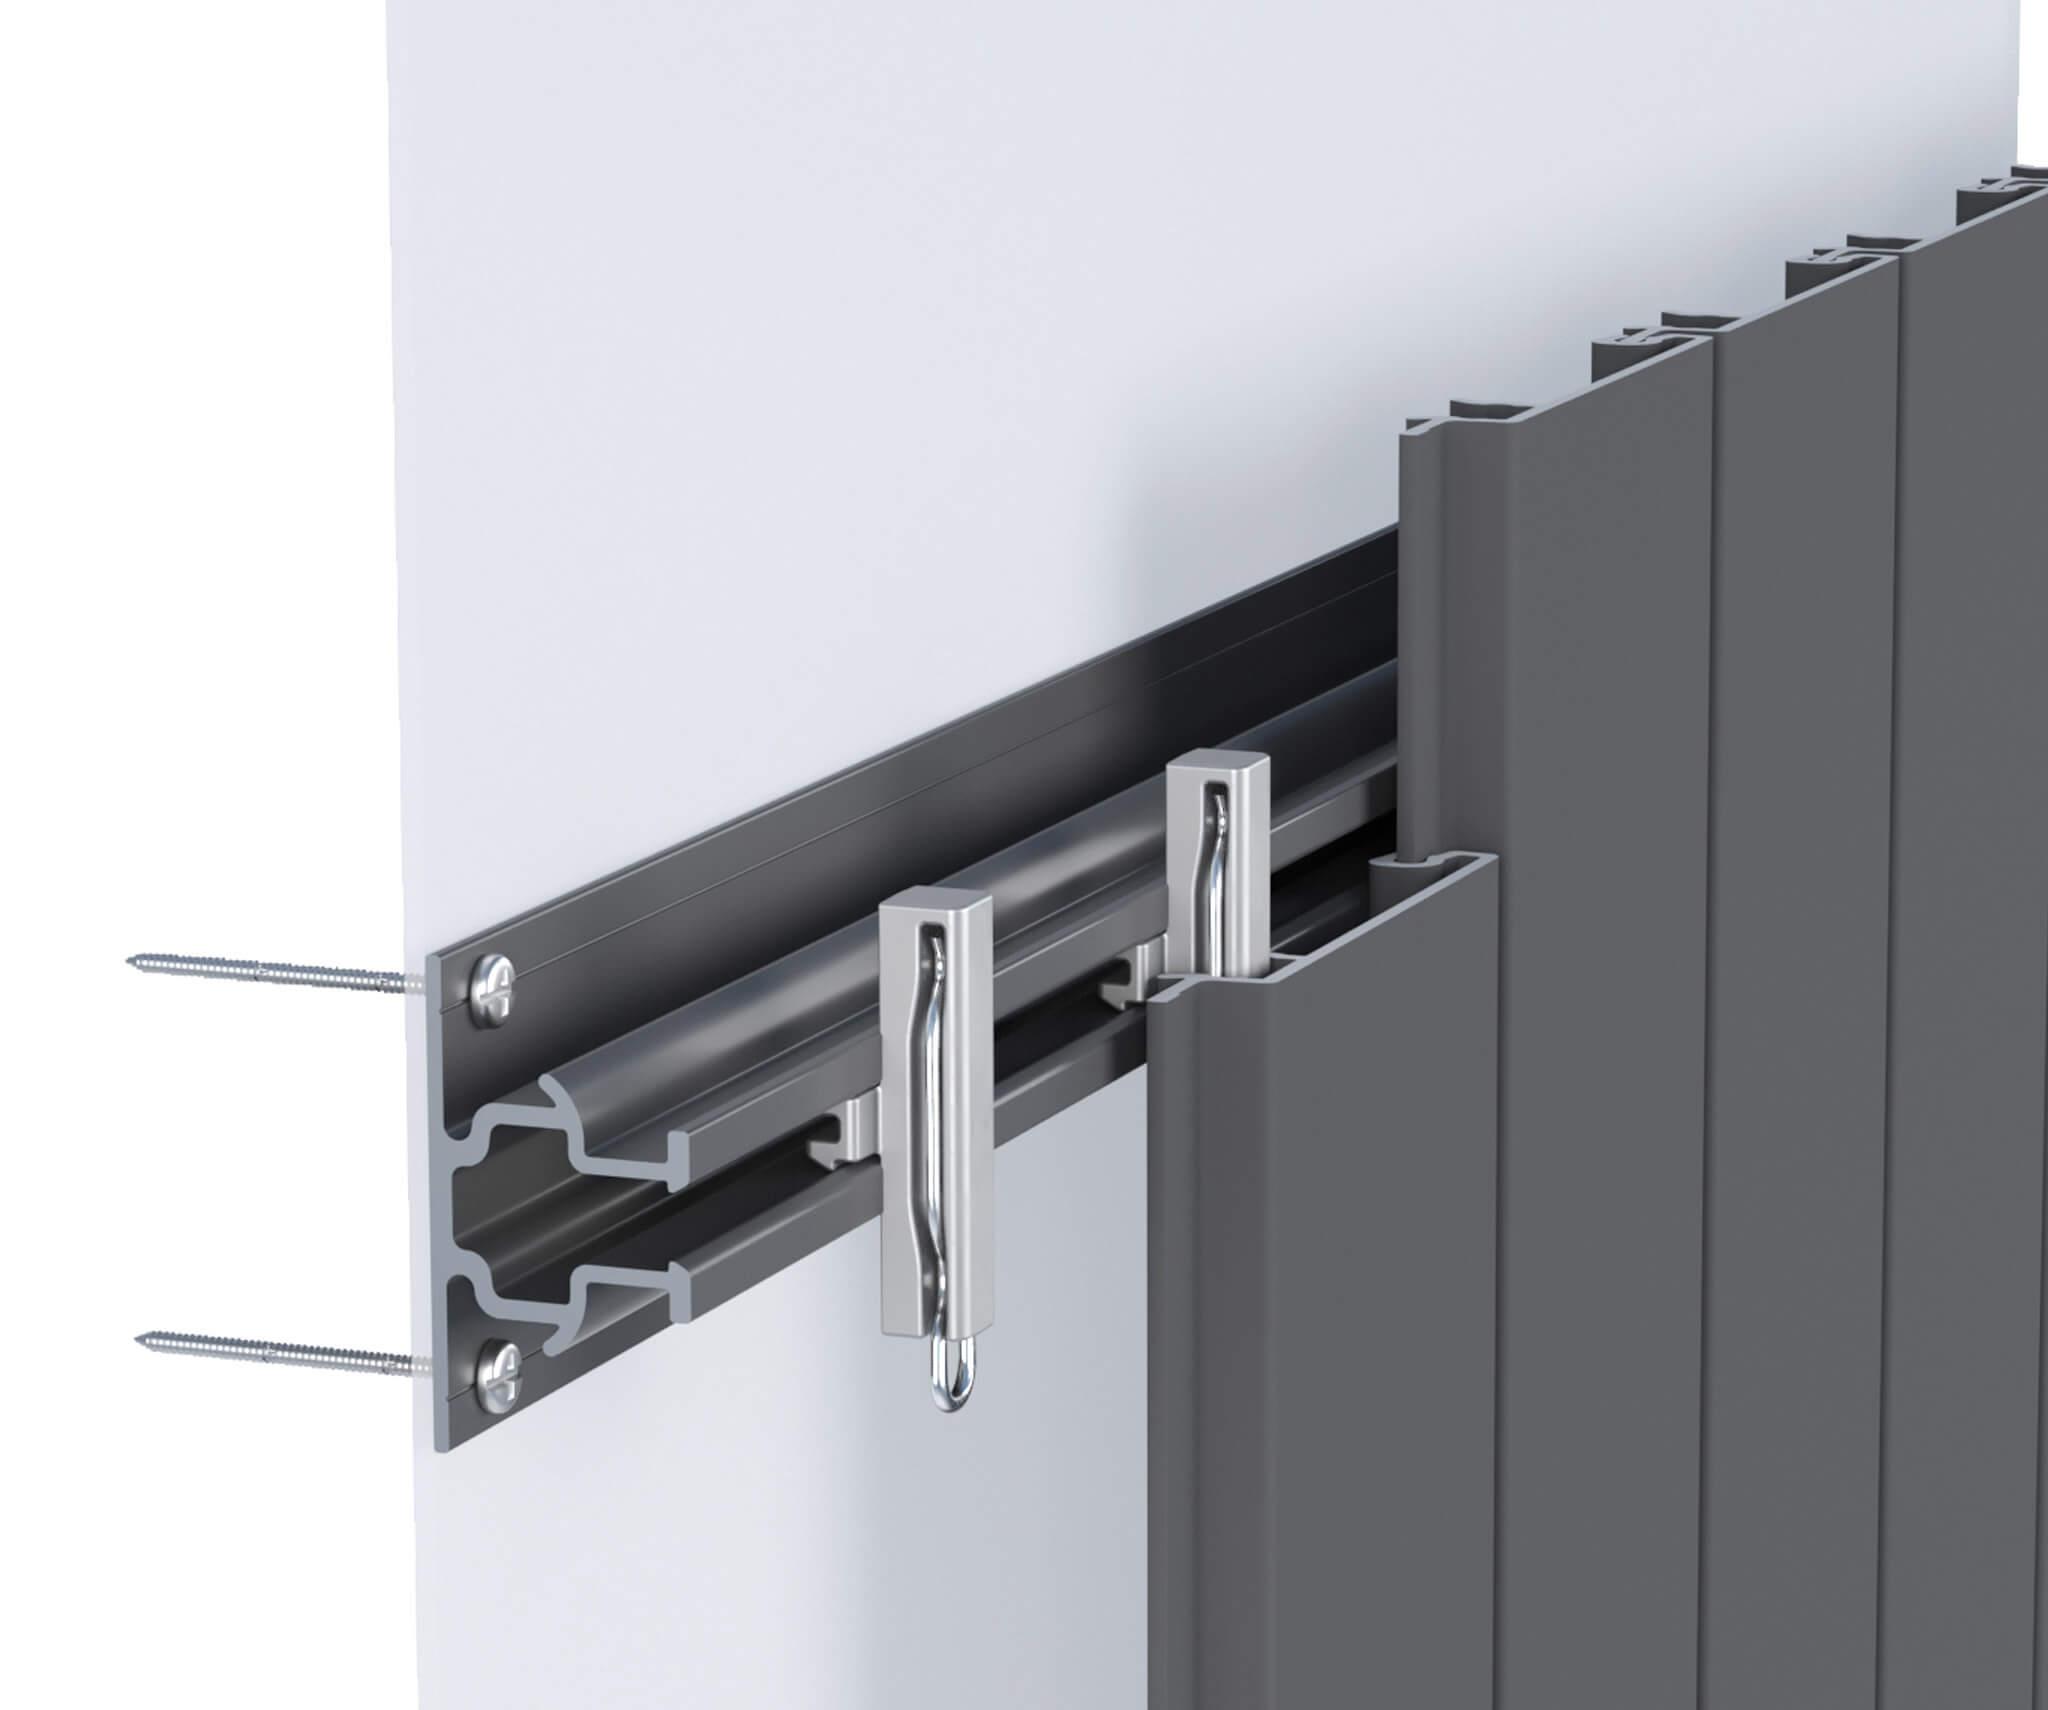 Sculptform Click-on Cladding standard mounting track